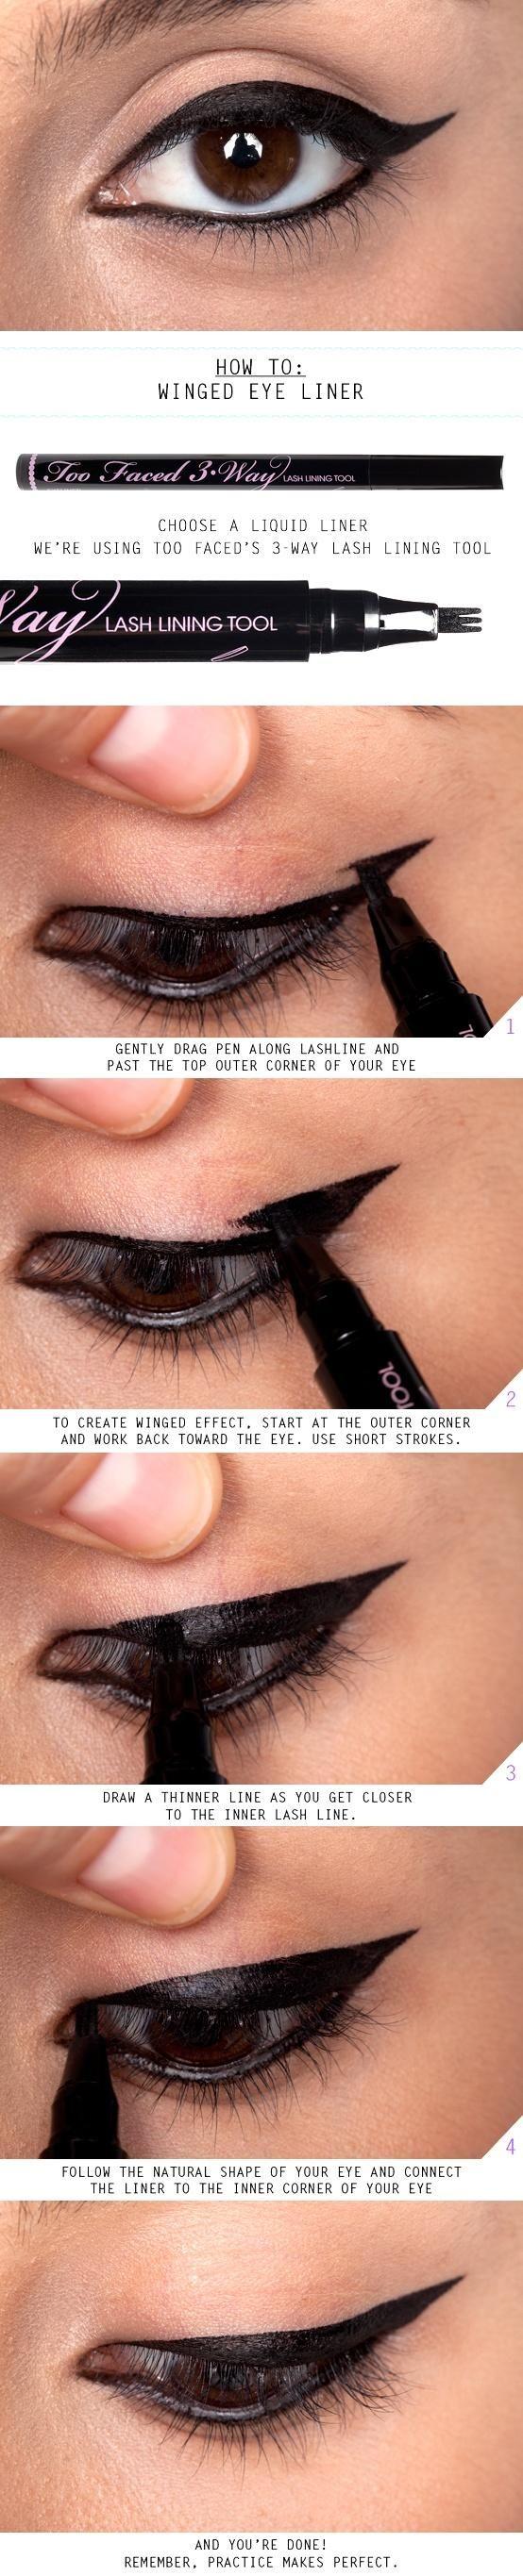 Winged eyeliner...plus more fun eye makeup tutorials!